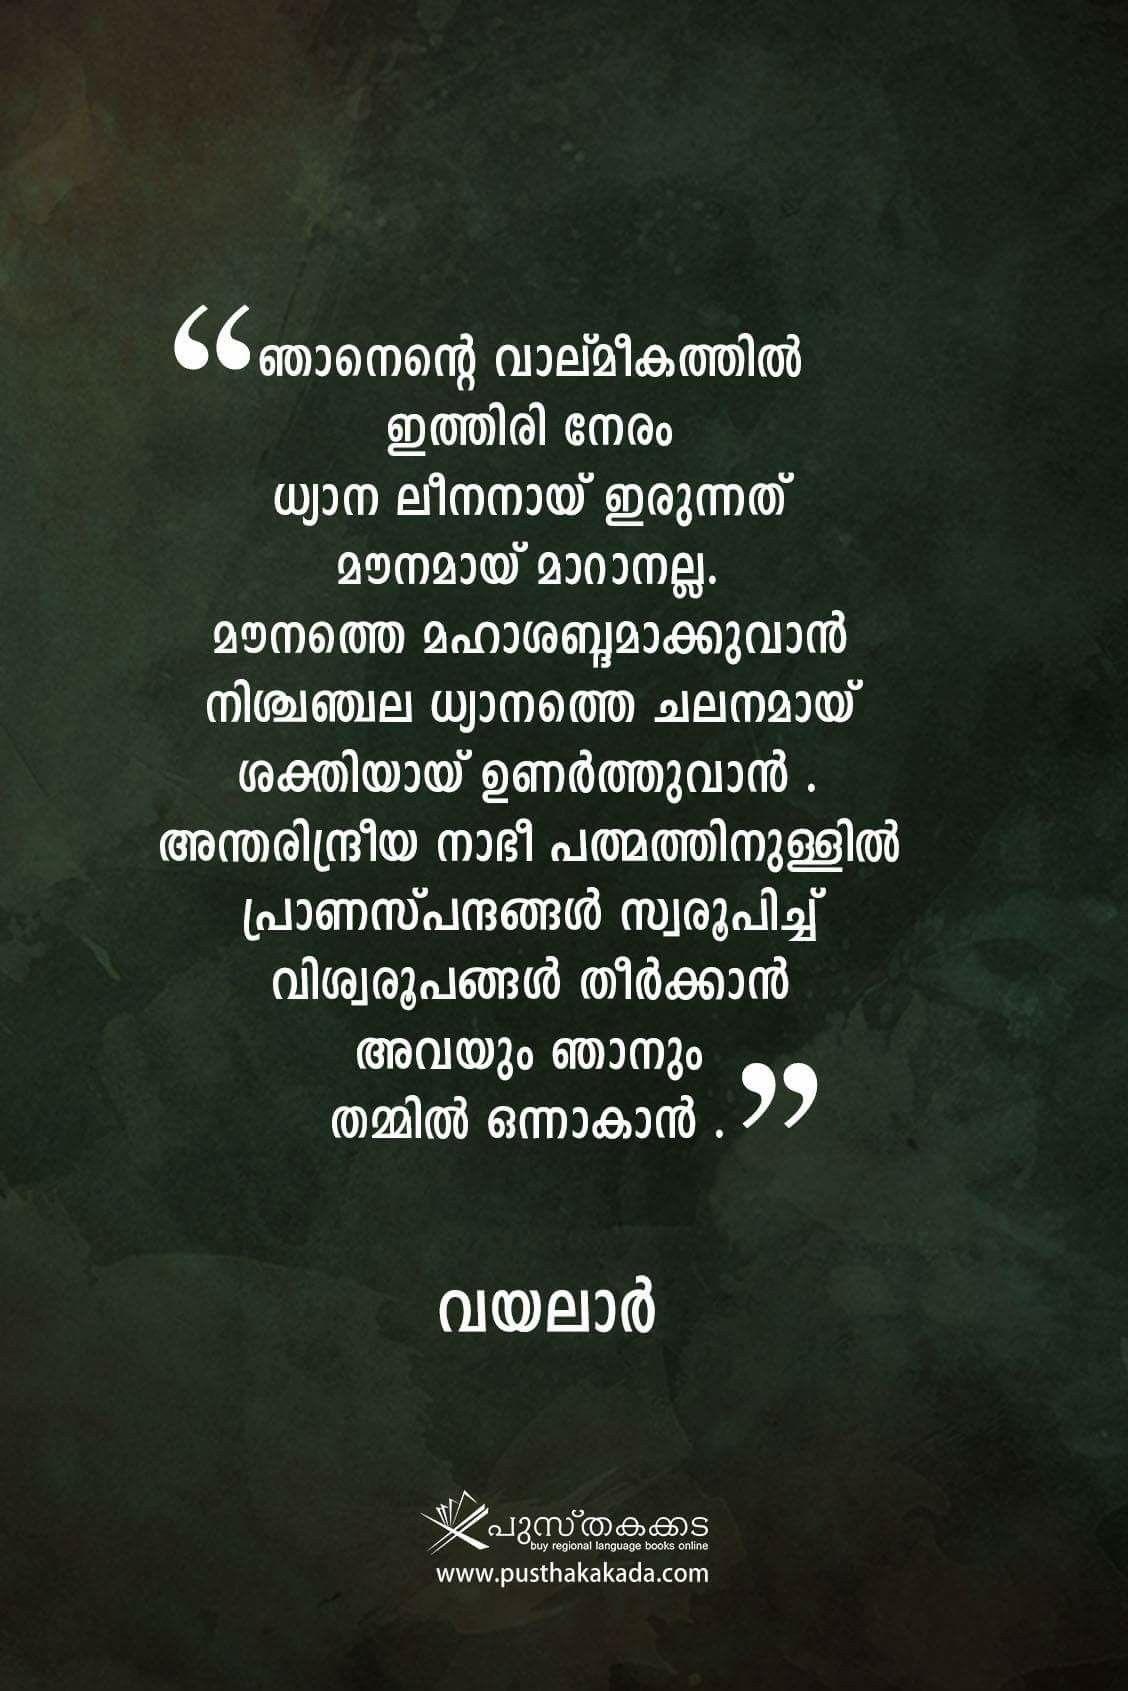 Malayalam Literature Quotes Literature quotes, Malayalam